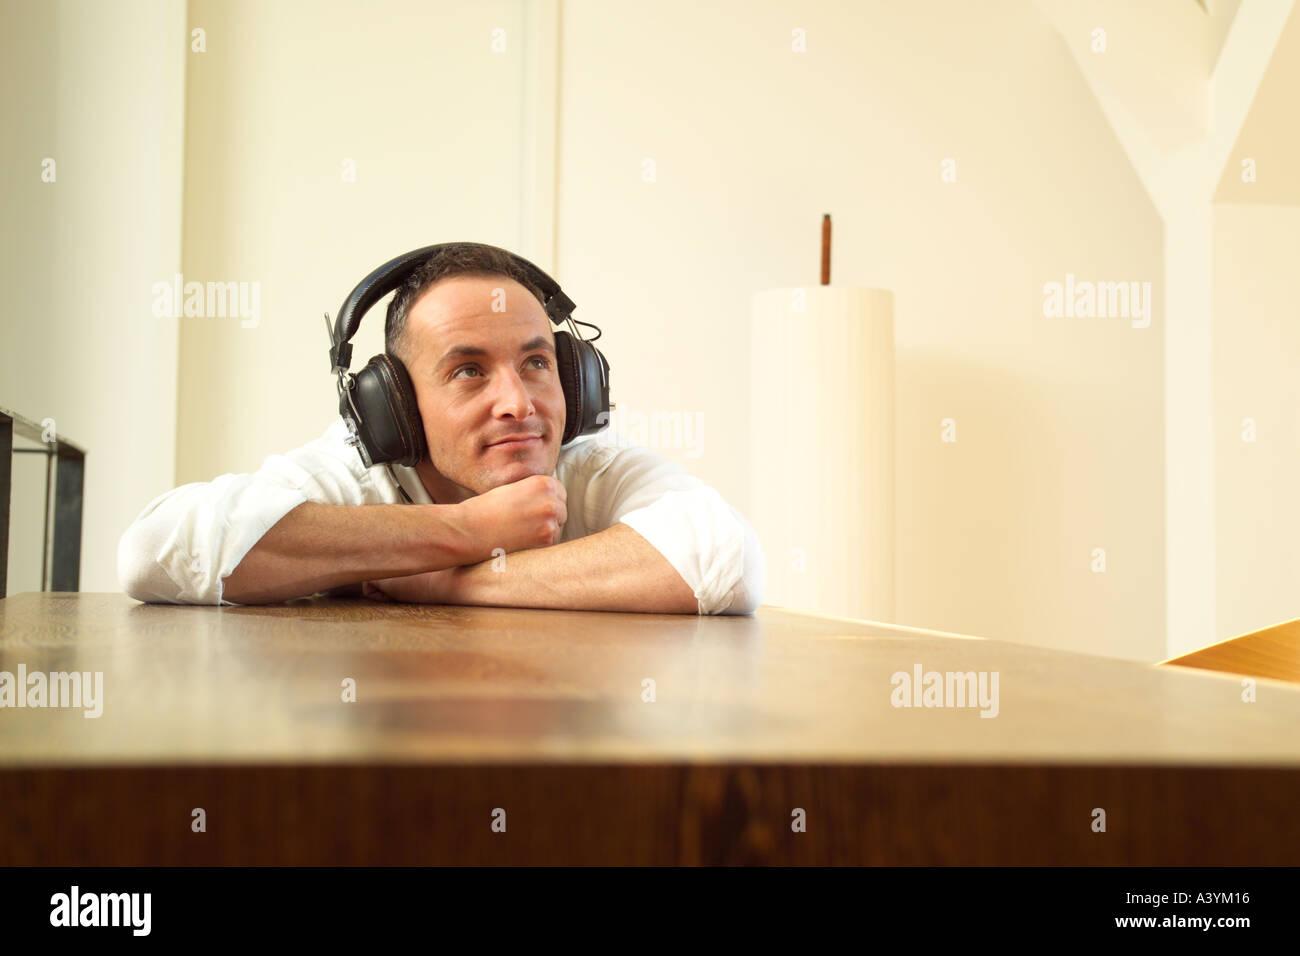 man listening to music on headphones - Stock Image